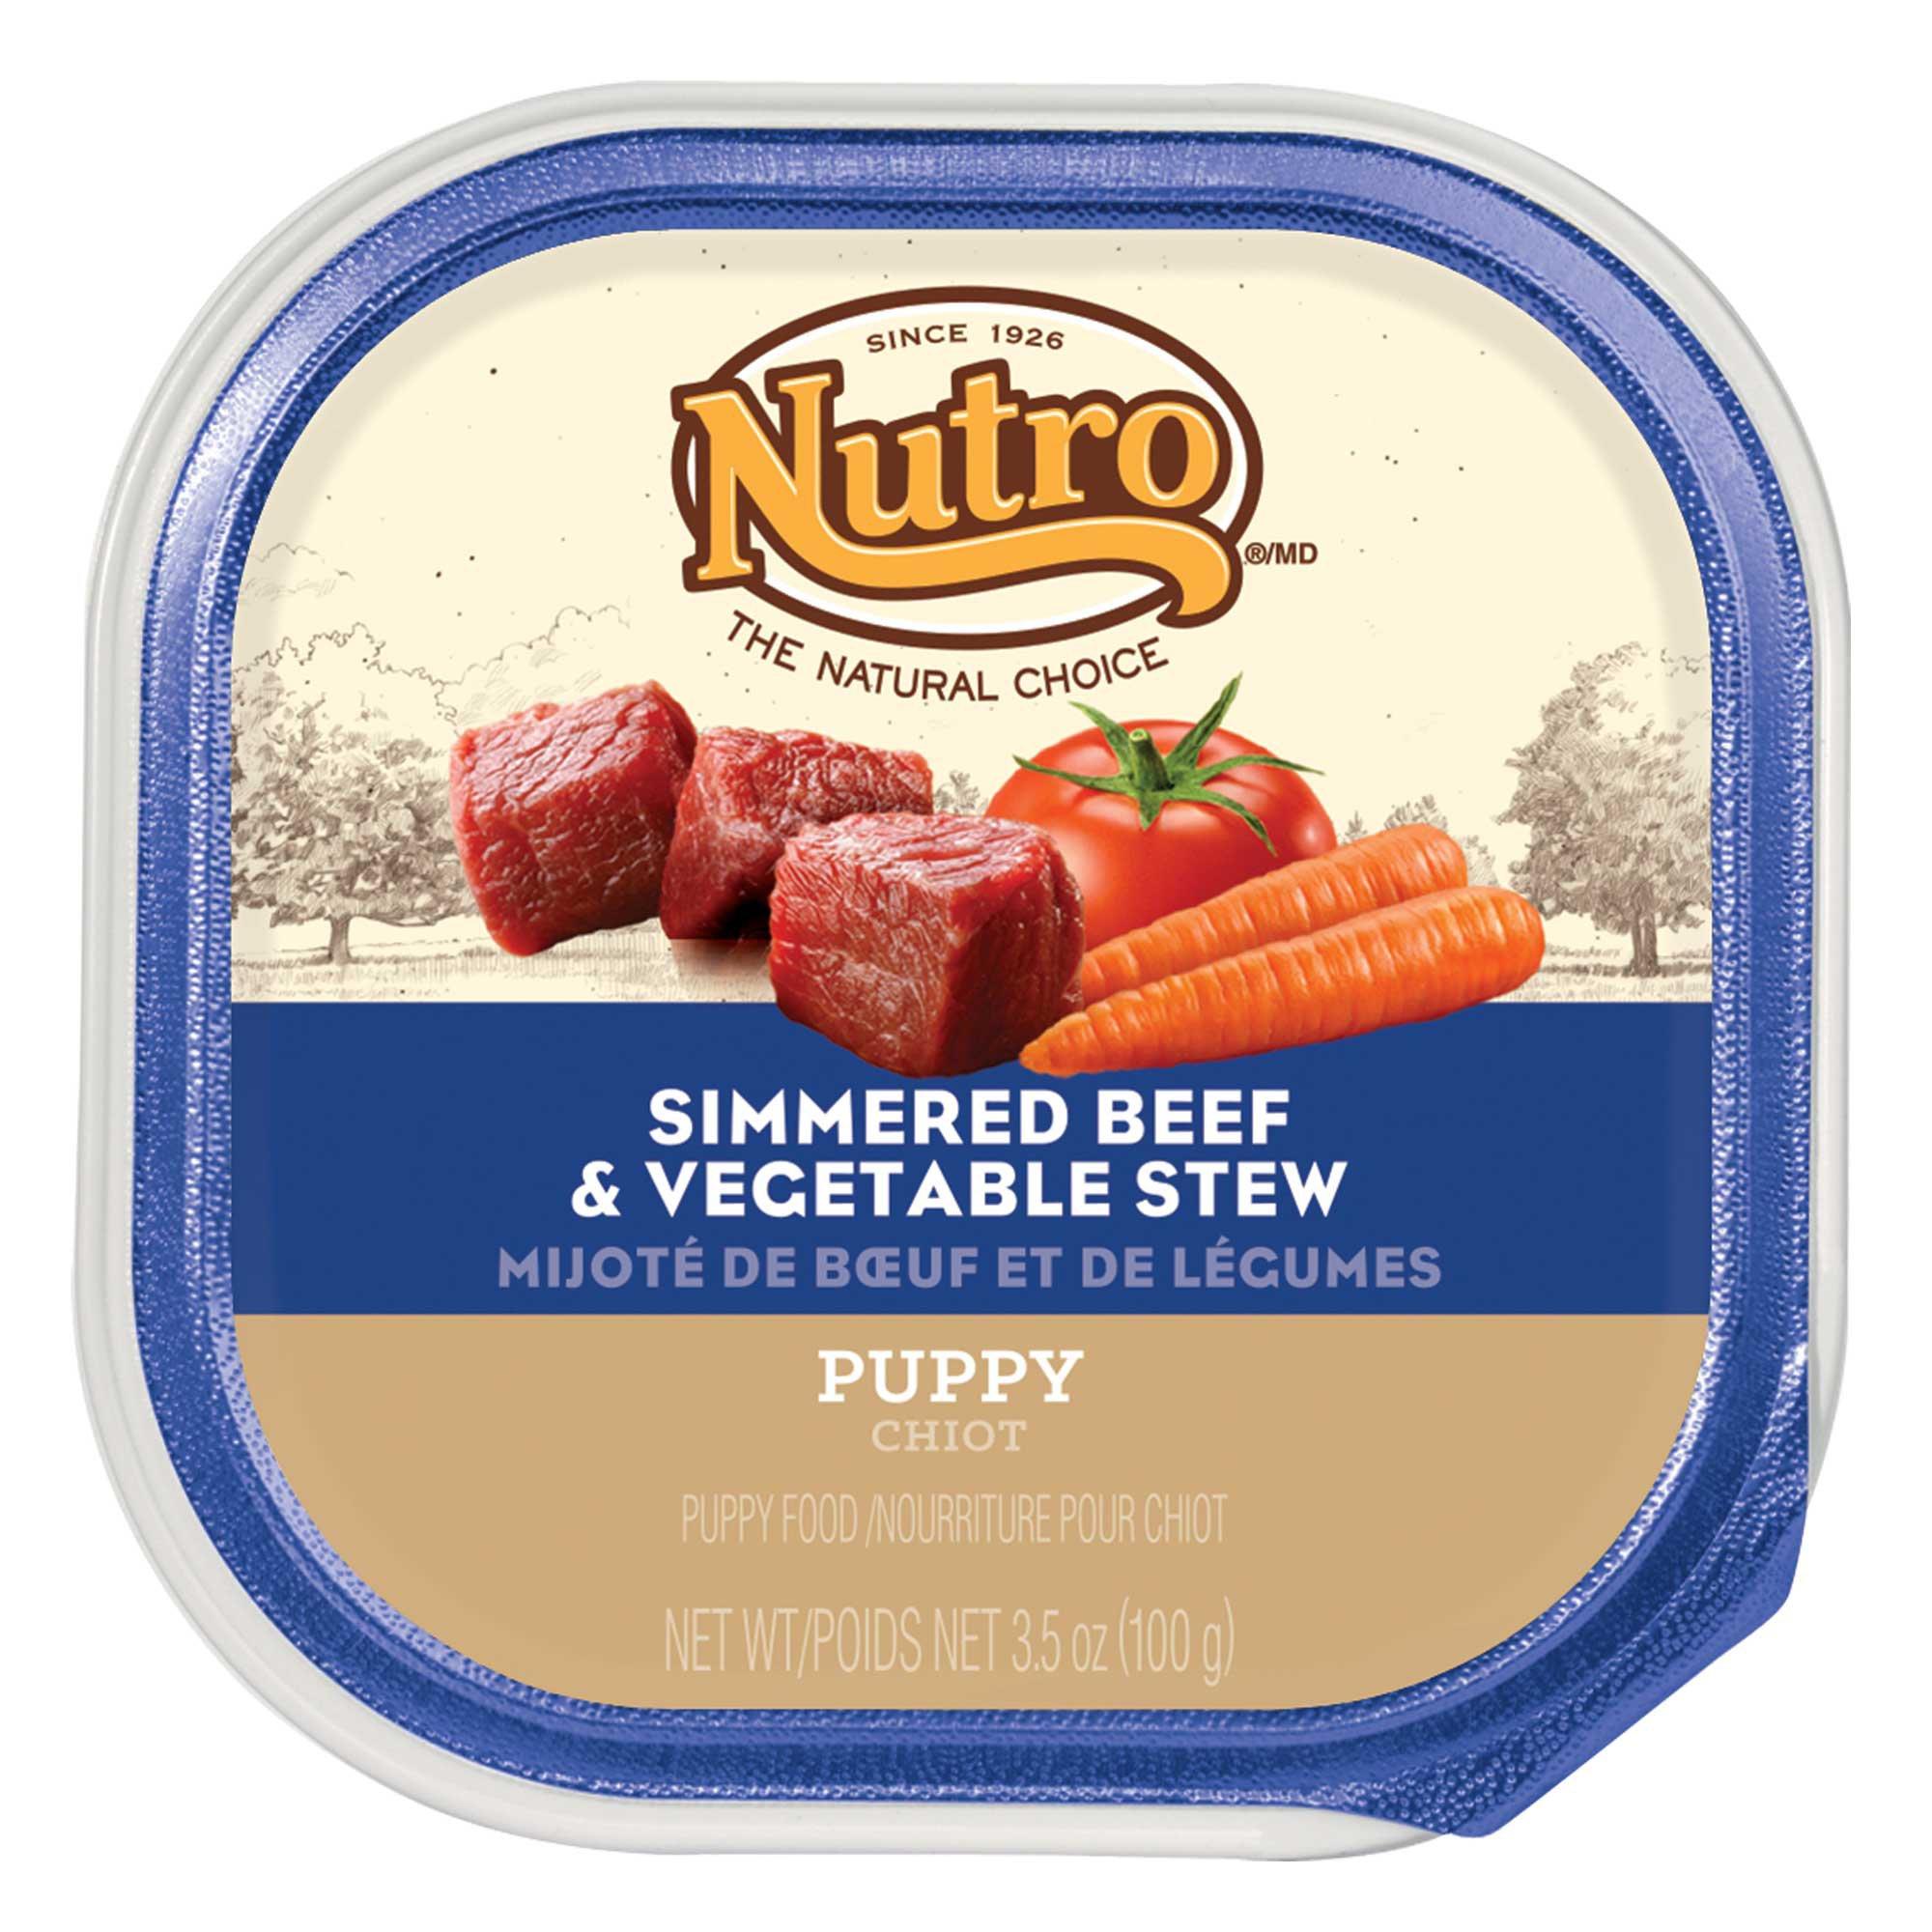 Nutro Beef & Vegetable Stew Puppy Food Trays